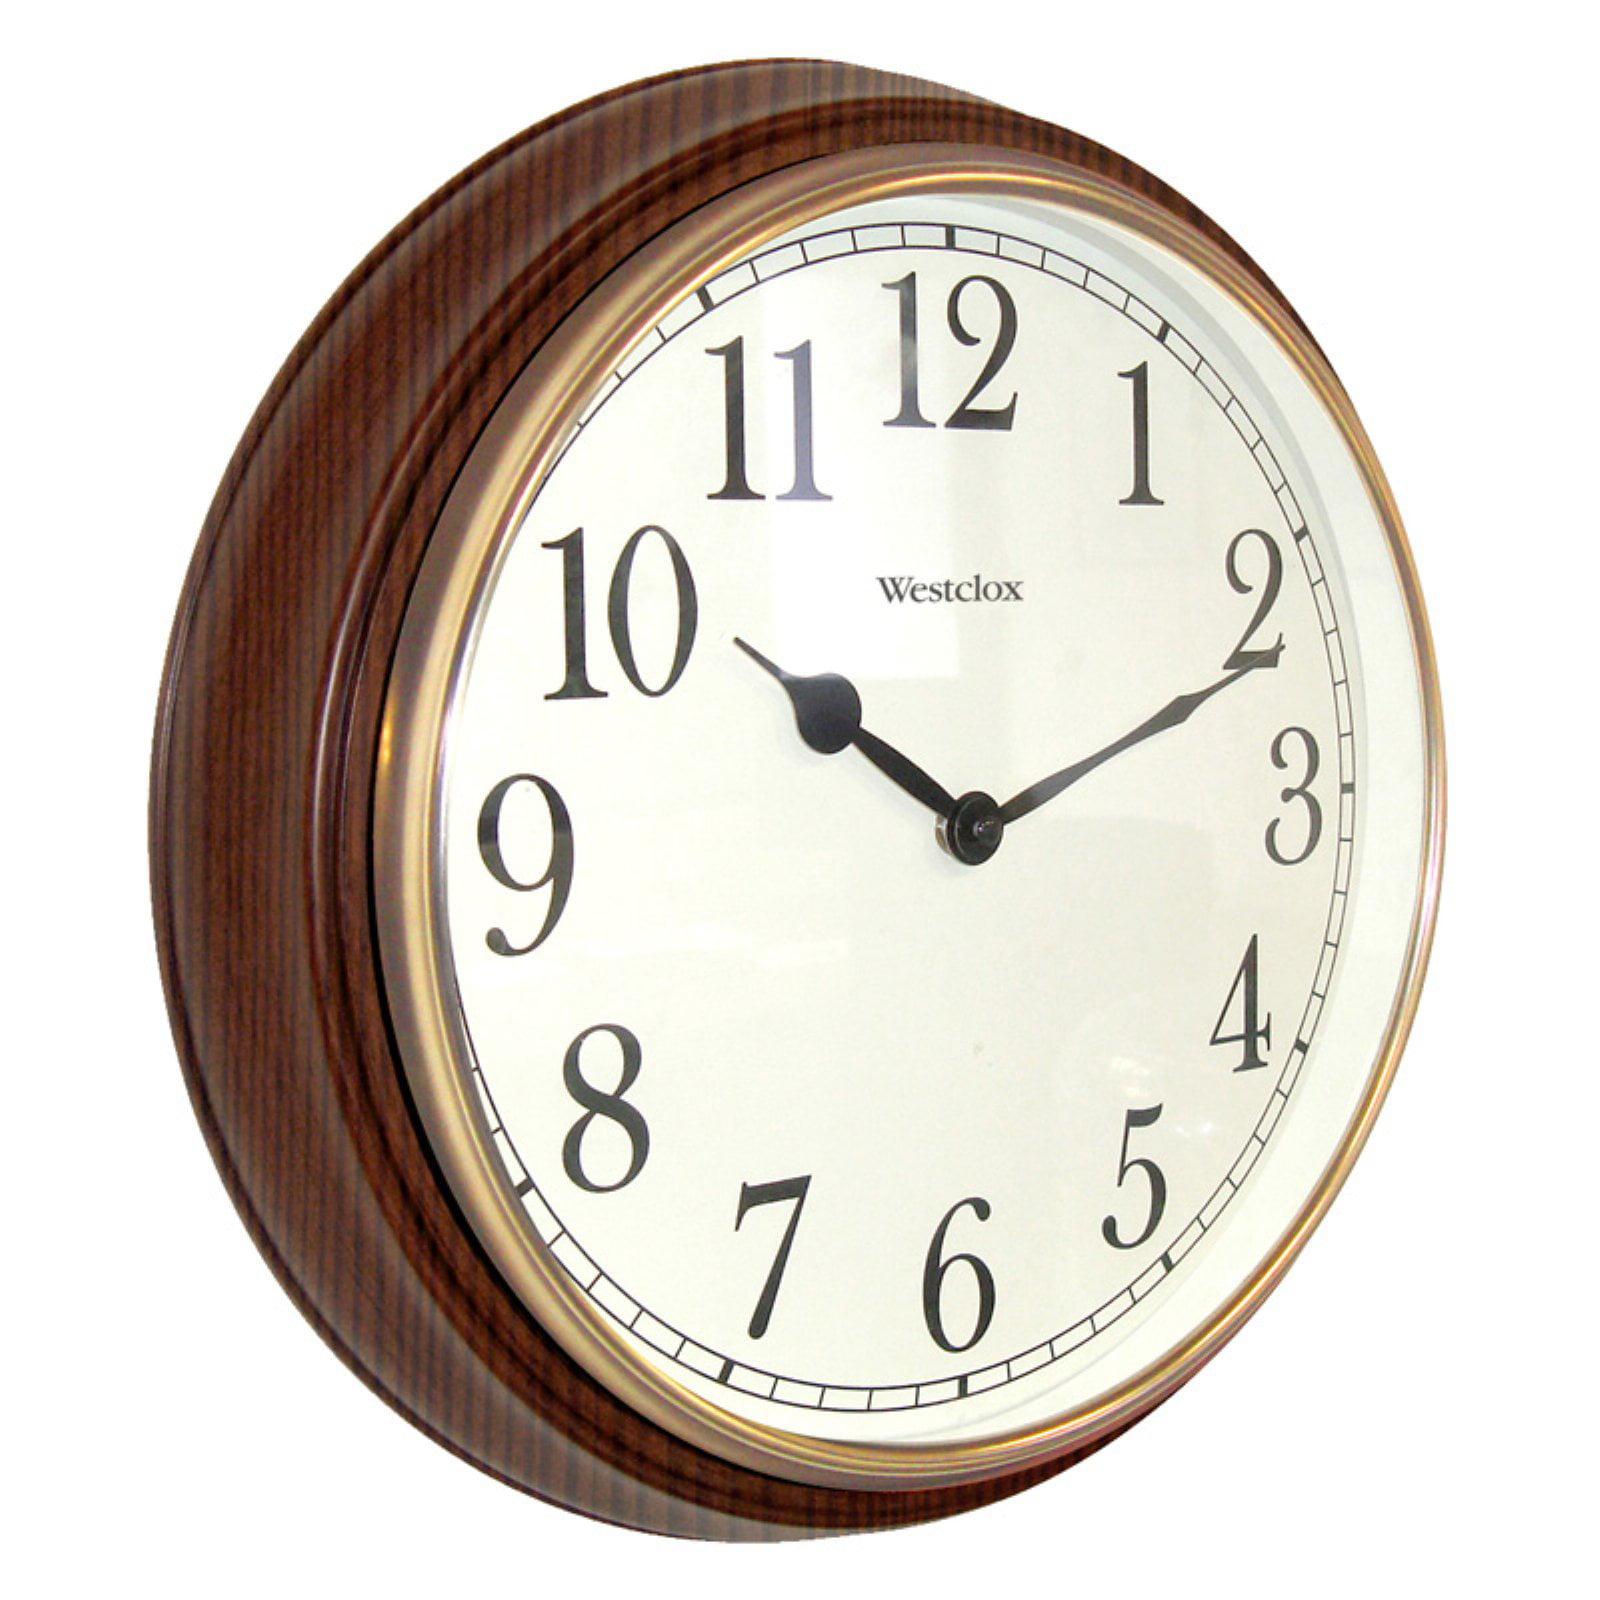 Westclox Clocks 15.5'' Round Wall Clock